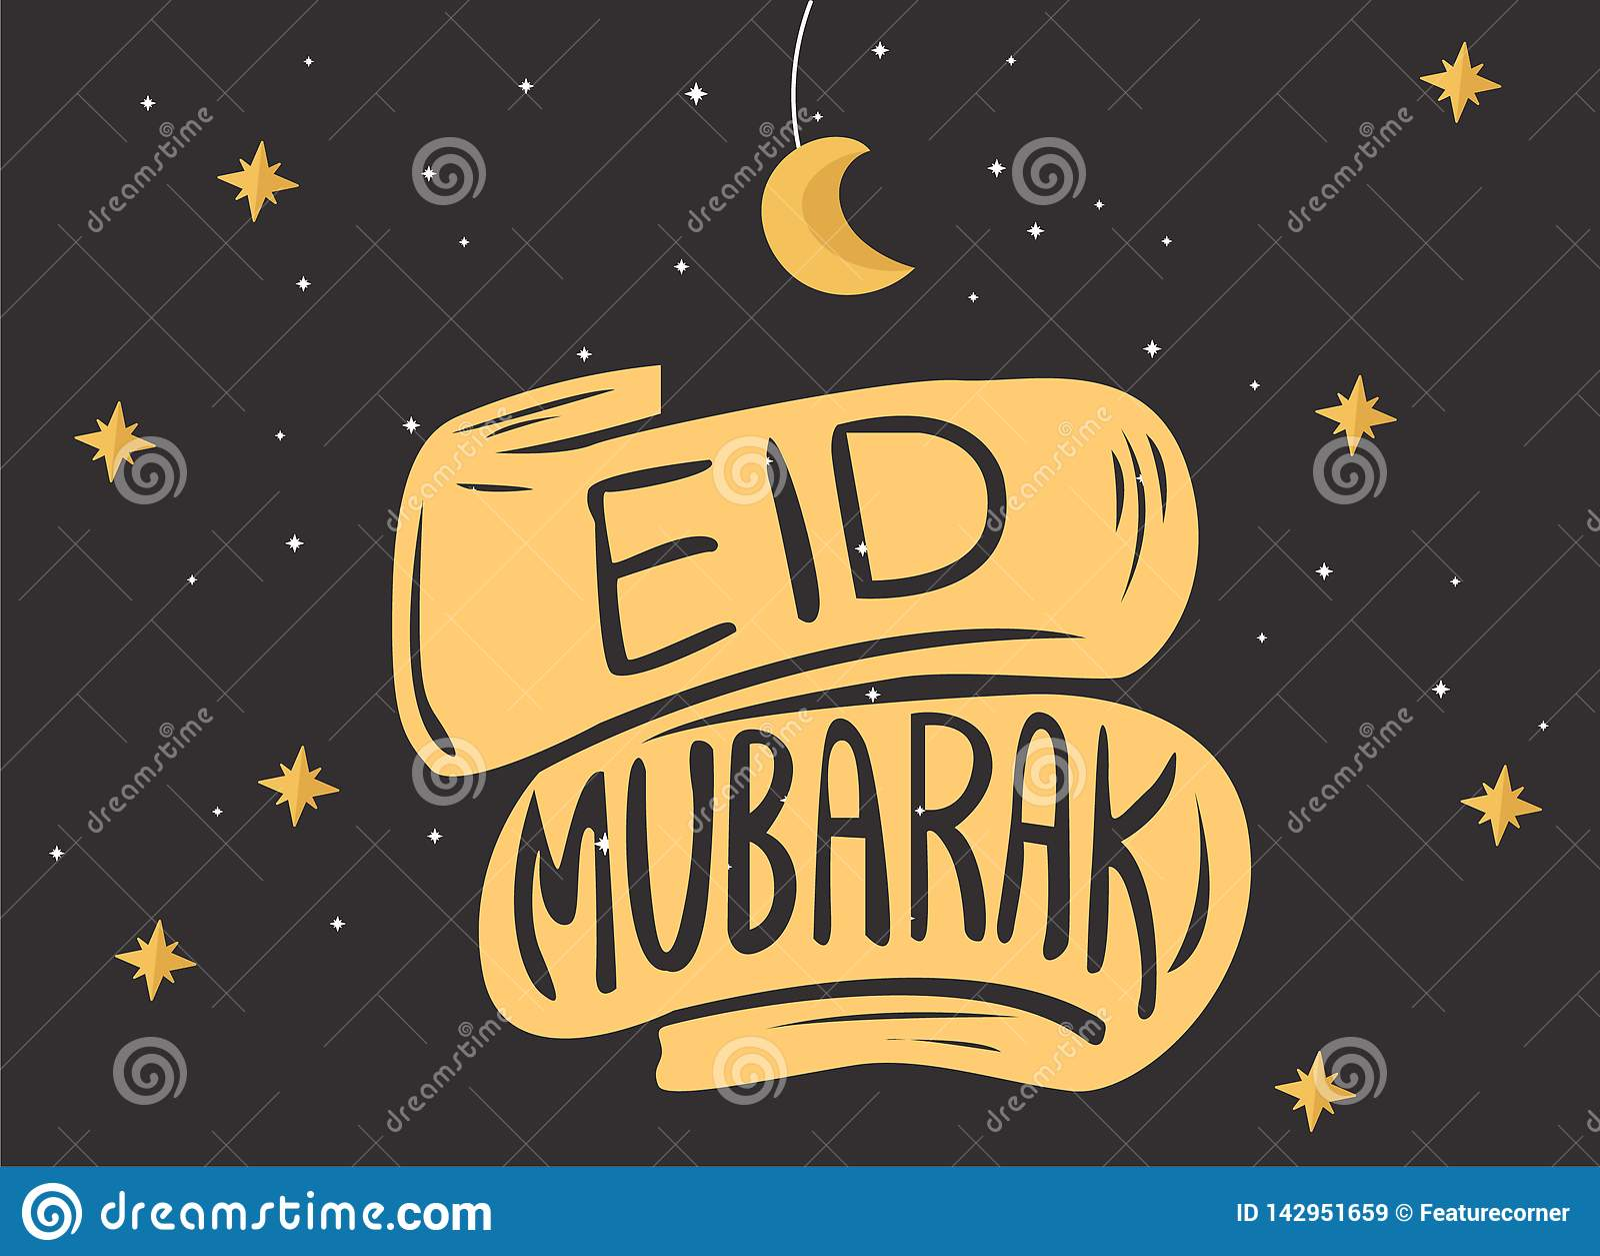 Eid穆巴拉克贺卡例证,横幅的,海报,背景,飞行物,例证斋月Kareem伊斯兰教的节日